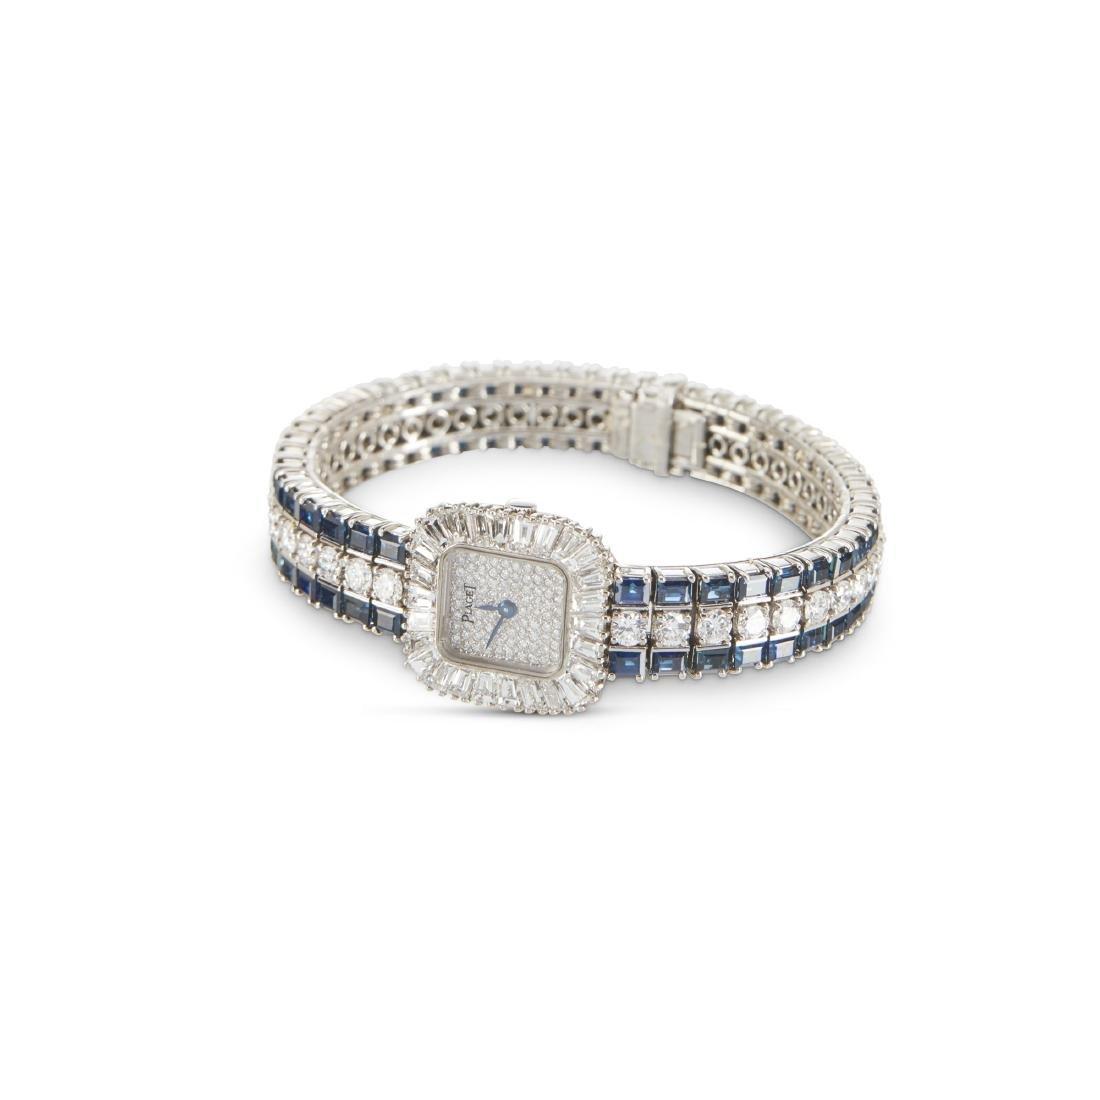 Piaget, 18K Diamond & Sapphire, Ref. 8480 H69